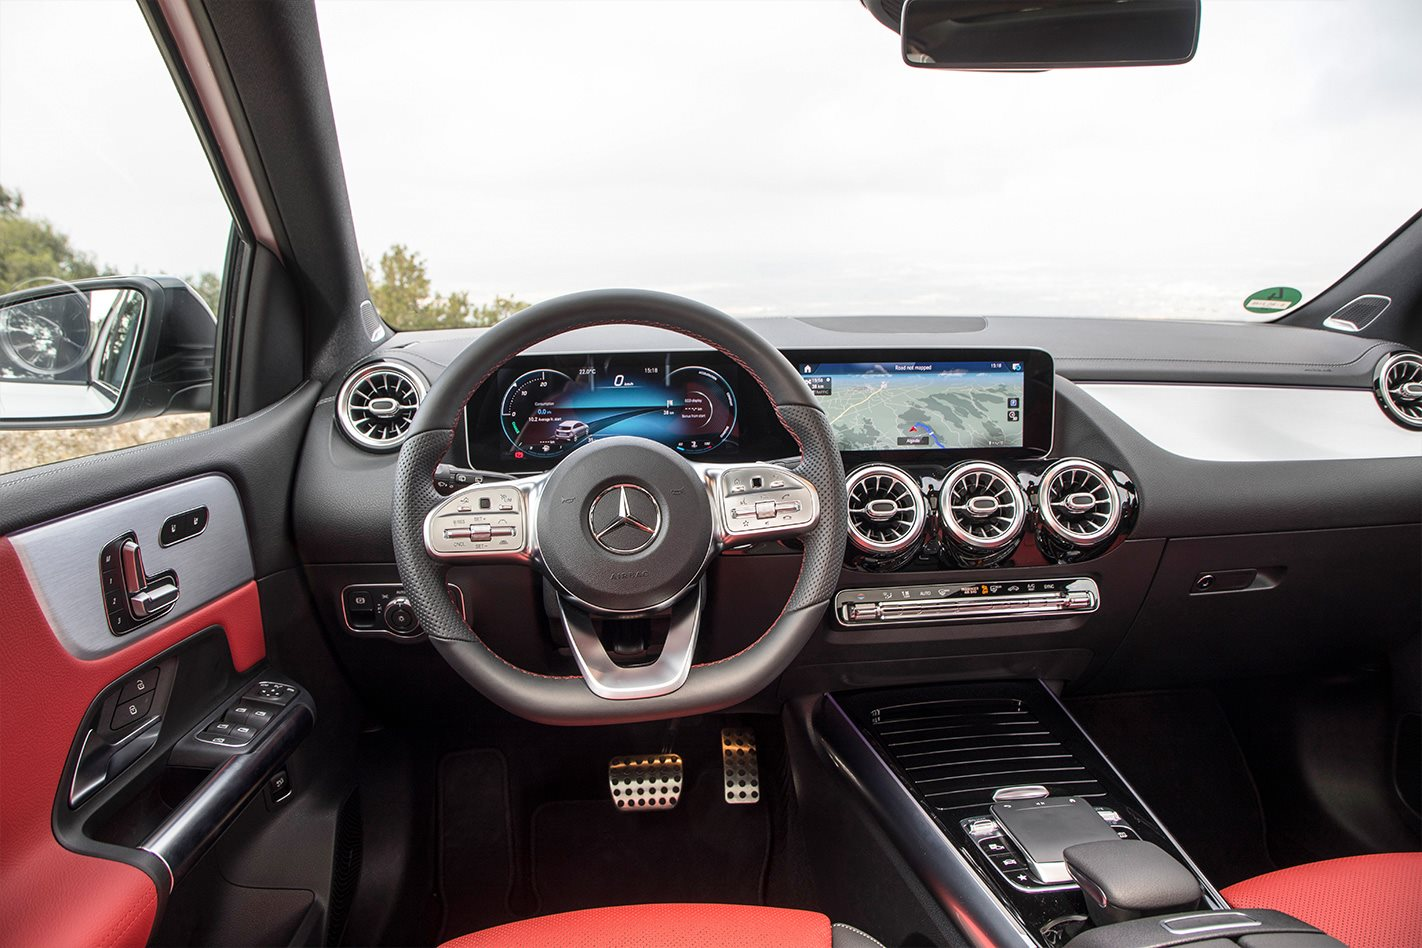 2019 Mercedes Benz B200 Review